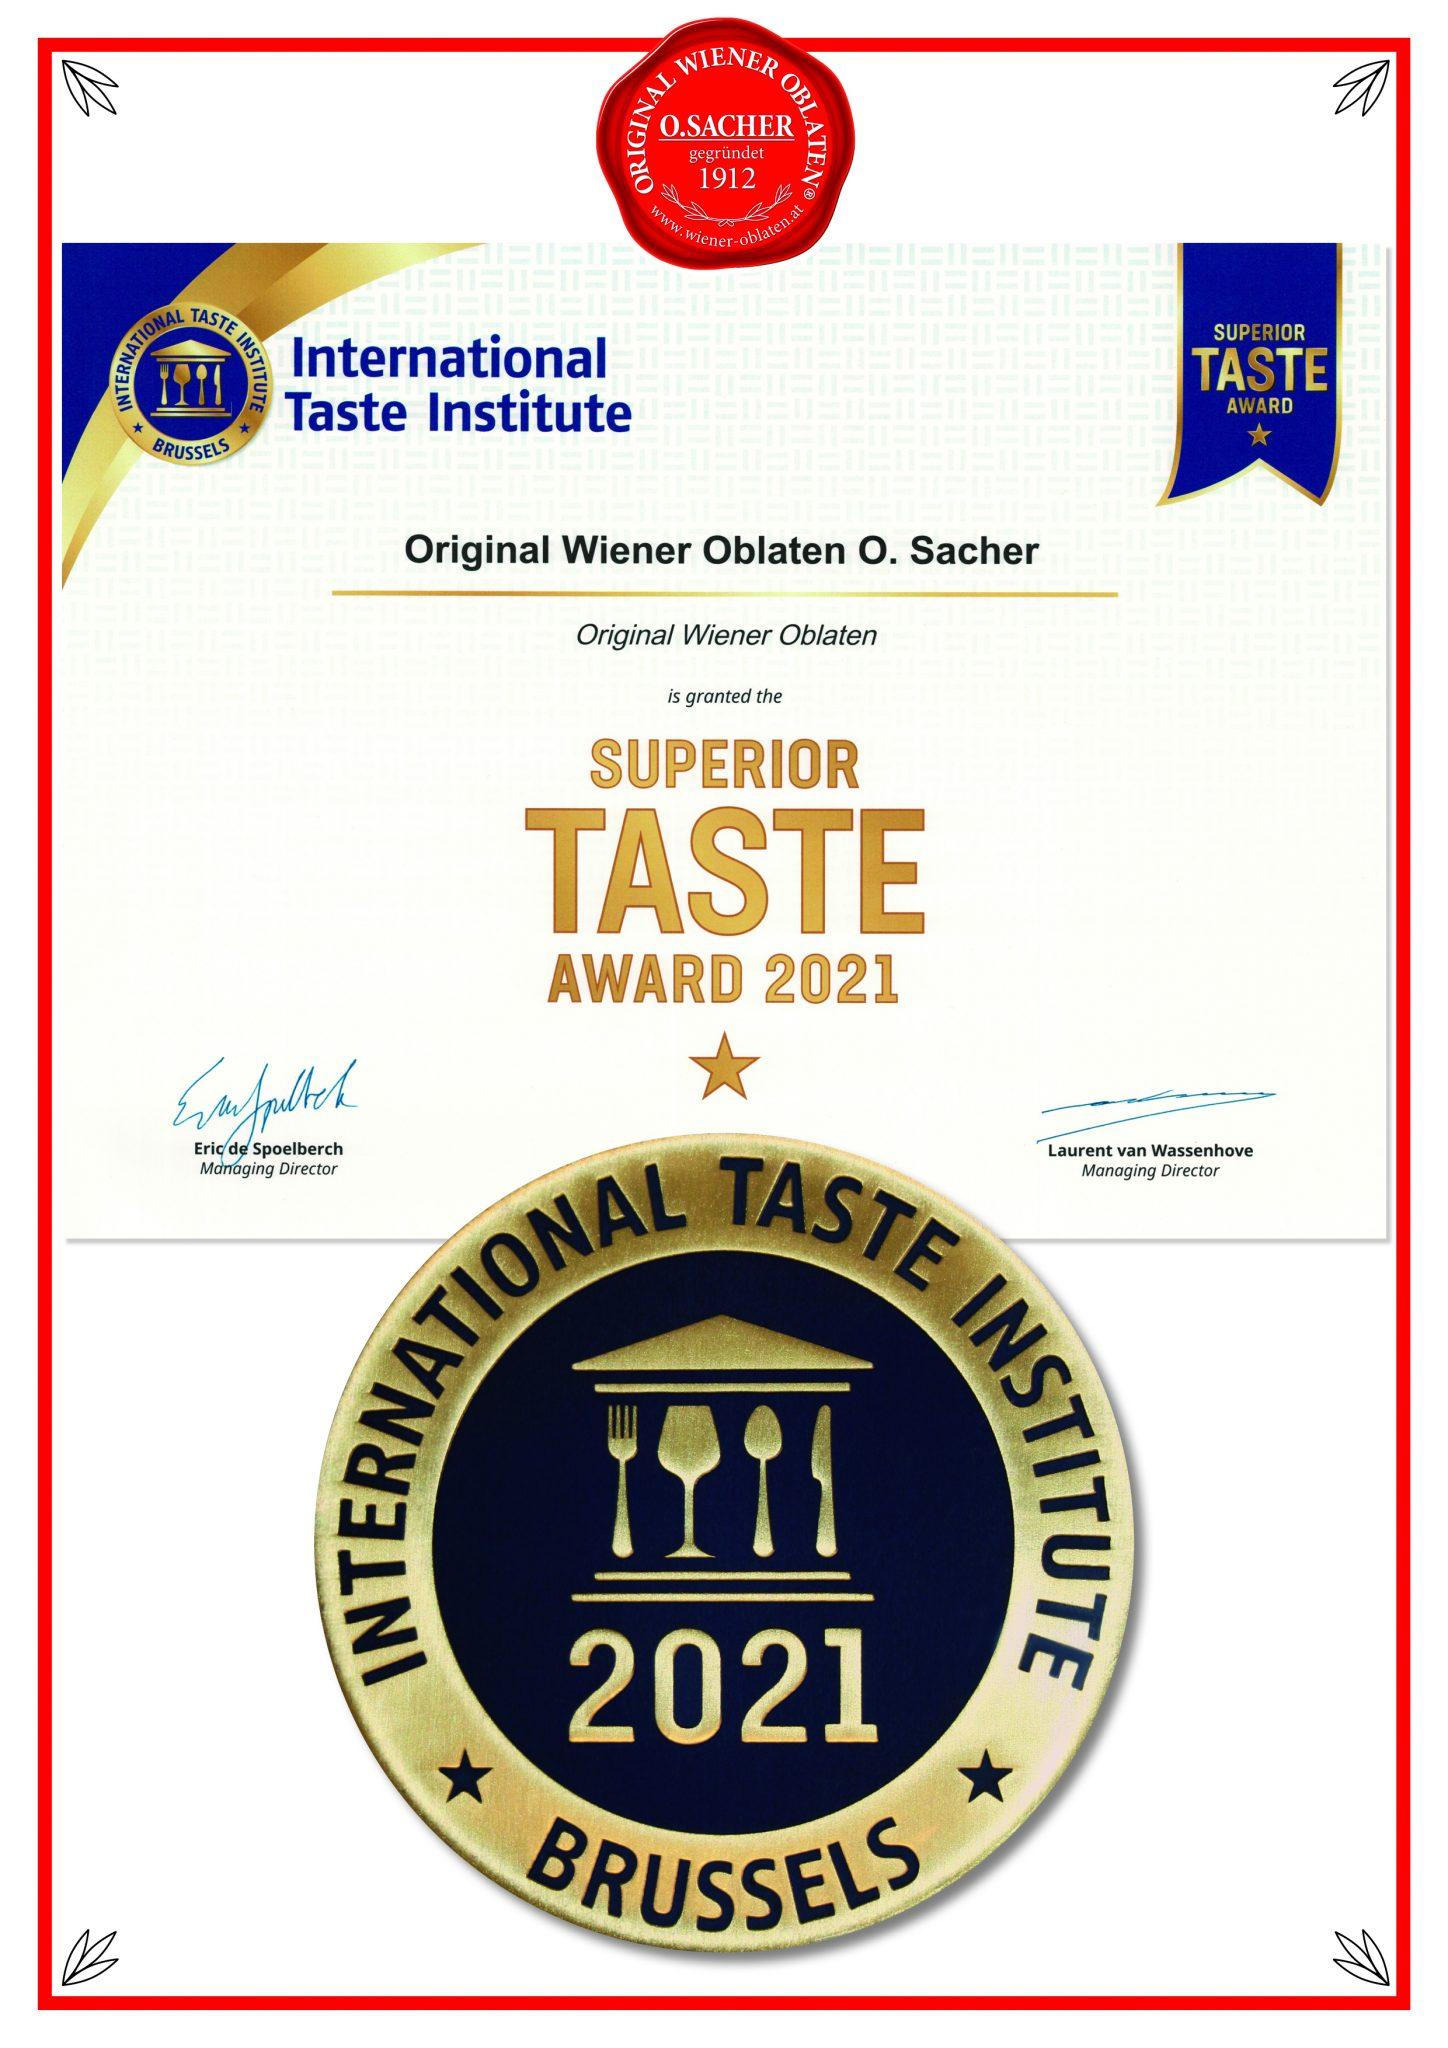 Super TASTE Award 2021 Original Wiener Oblaten